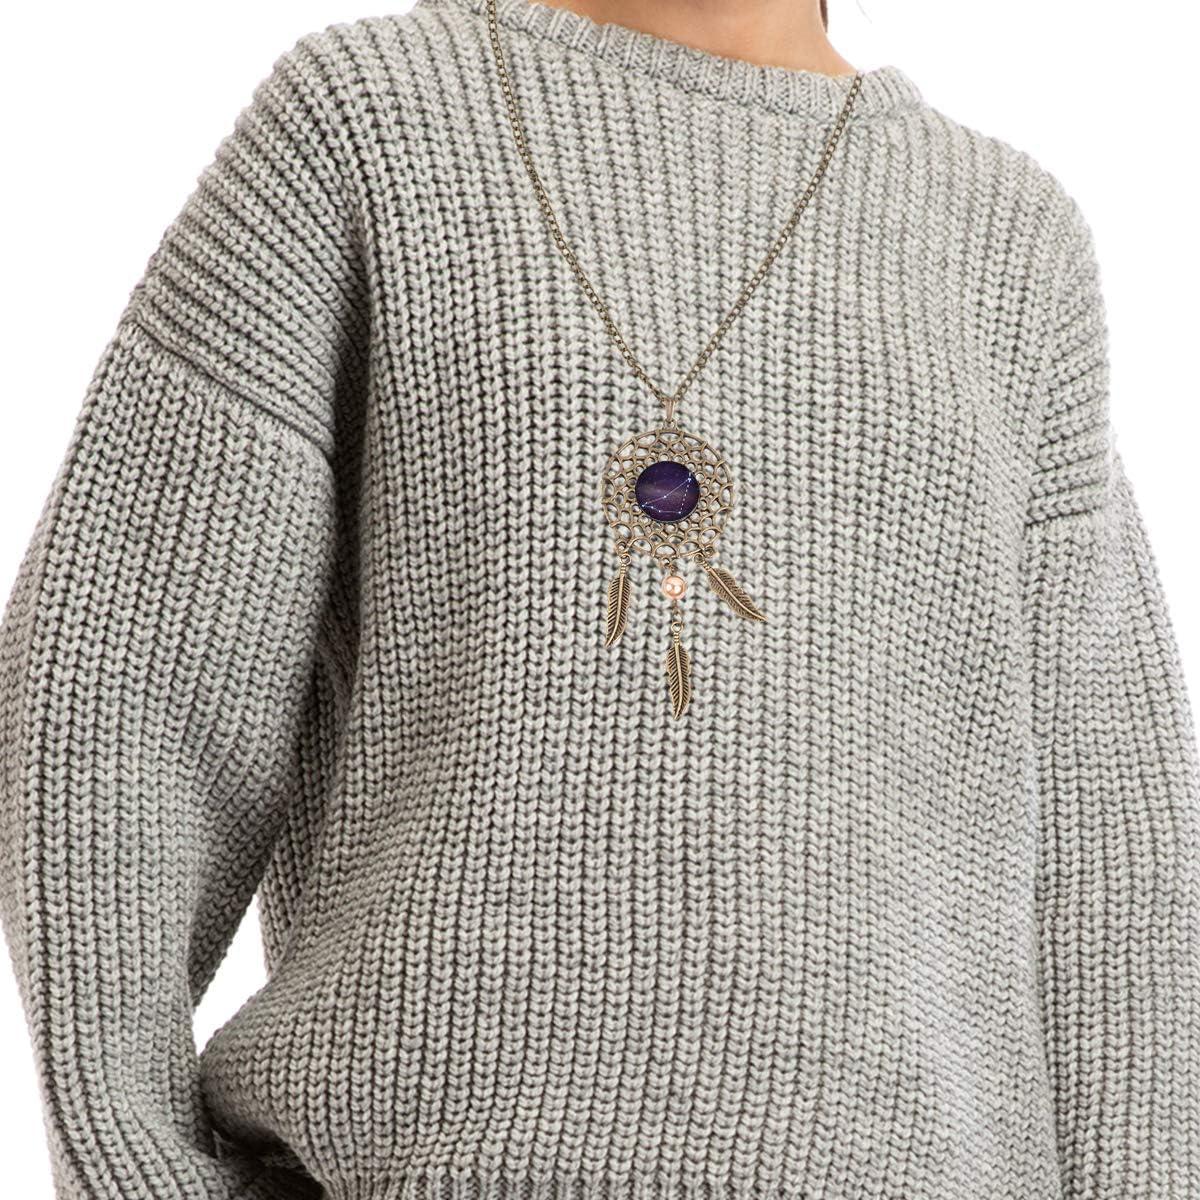 Queen Area Dream Catcher Necklace Capricornus Pendant Dangling Feather Tassel Bead Charm Chain Jewelry for Women